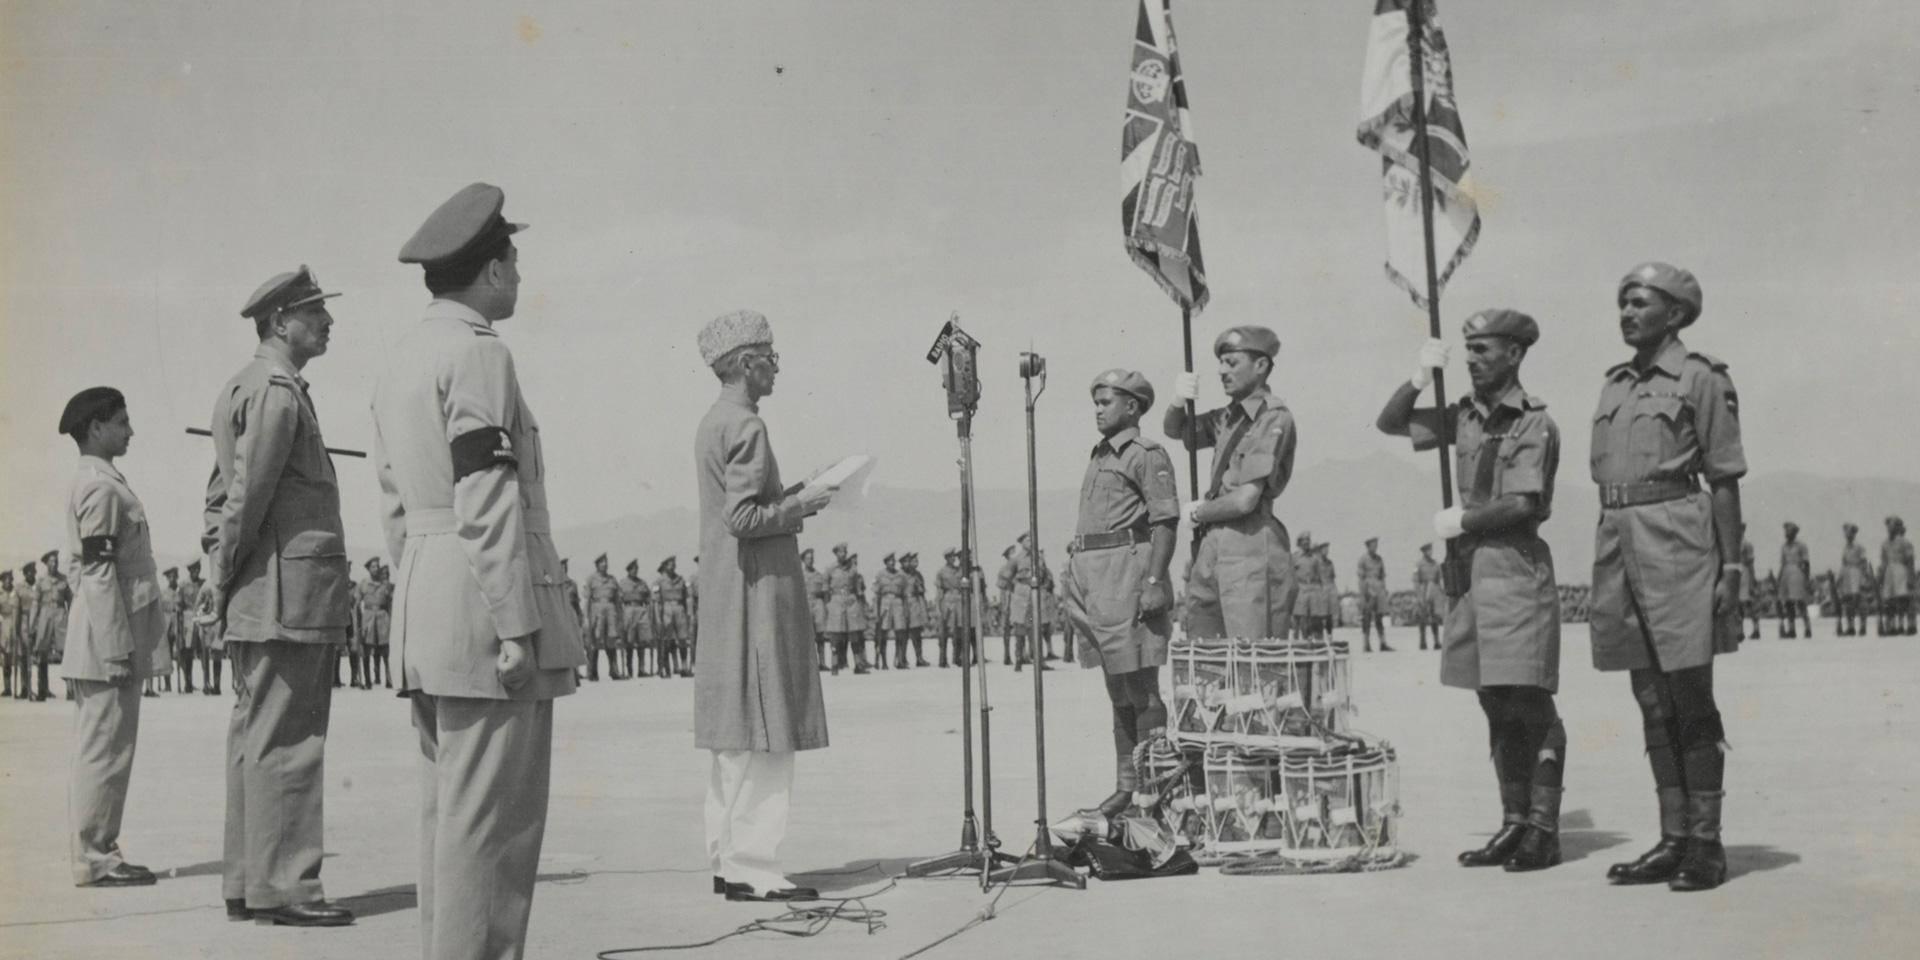 Presentation of Colours to 2nd Battalion, 15th Punjab Regiment, by Mohammad Ali Jinnah Qaid-i-Azam, Peshawar, Pakistan, 15 April 1948